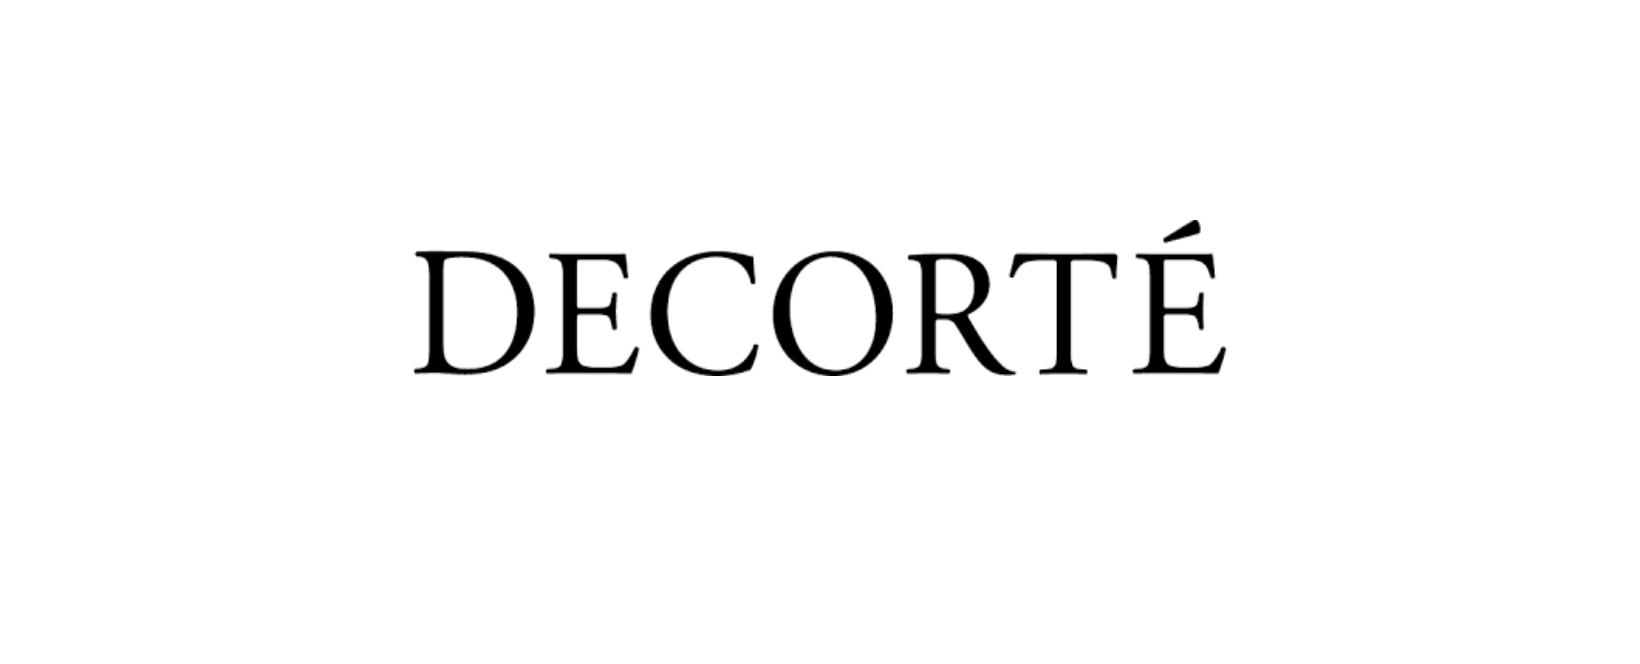 Decorte Cosmetics Discount Code 2021